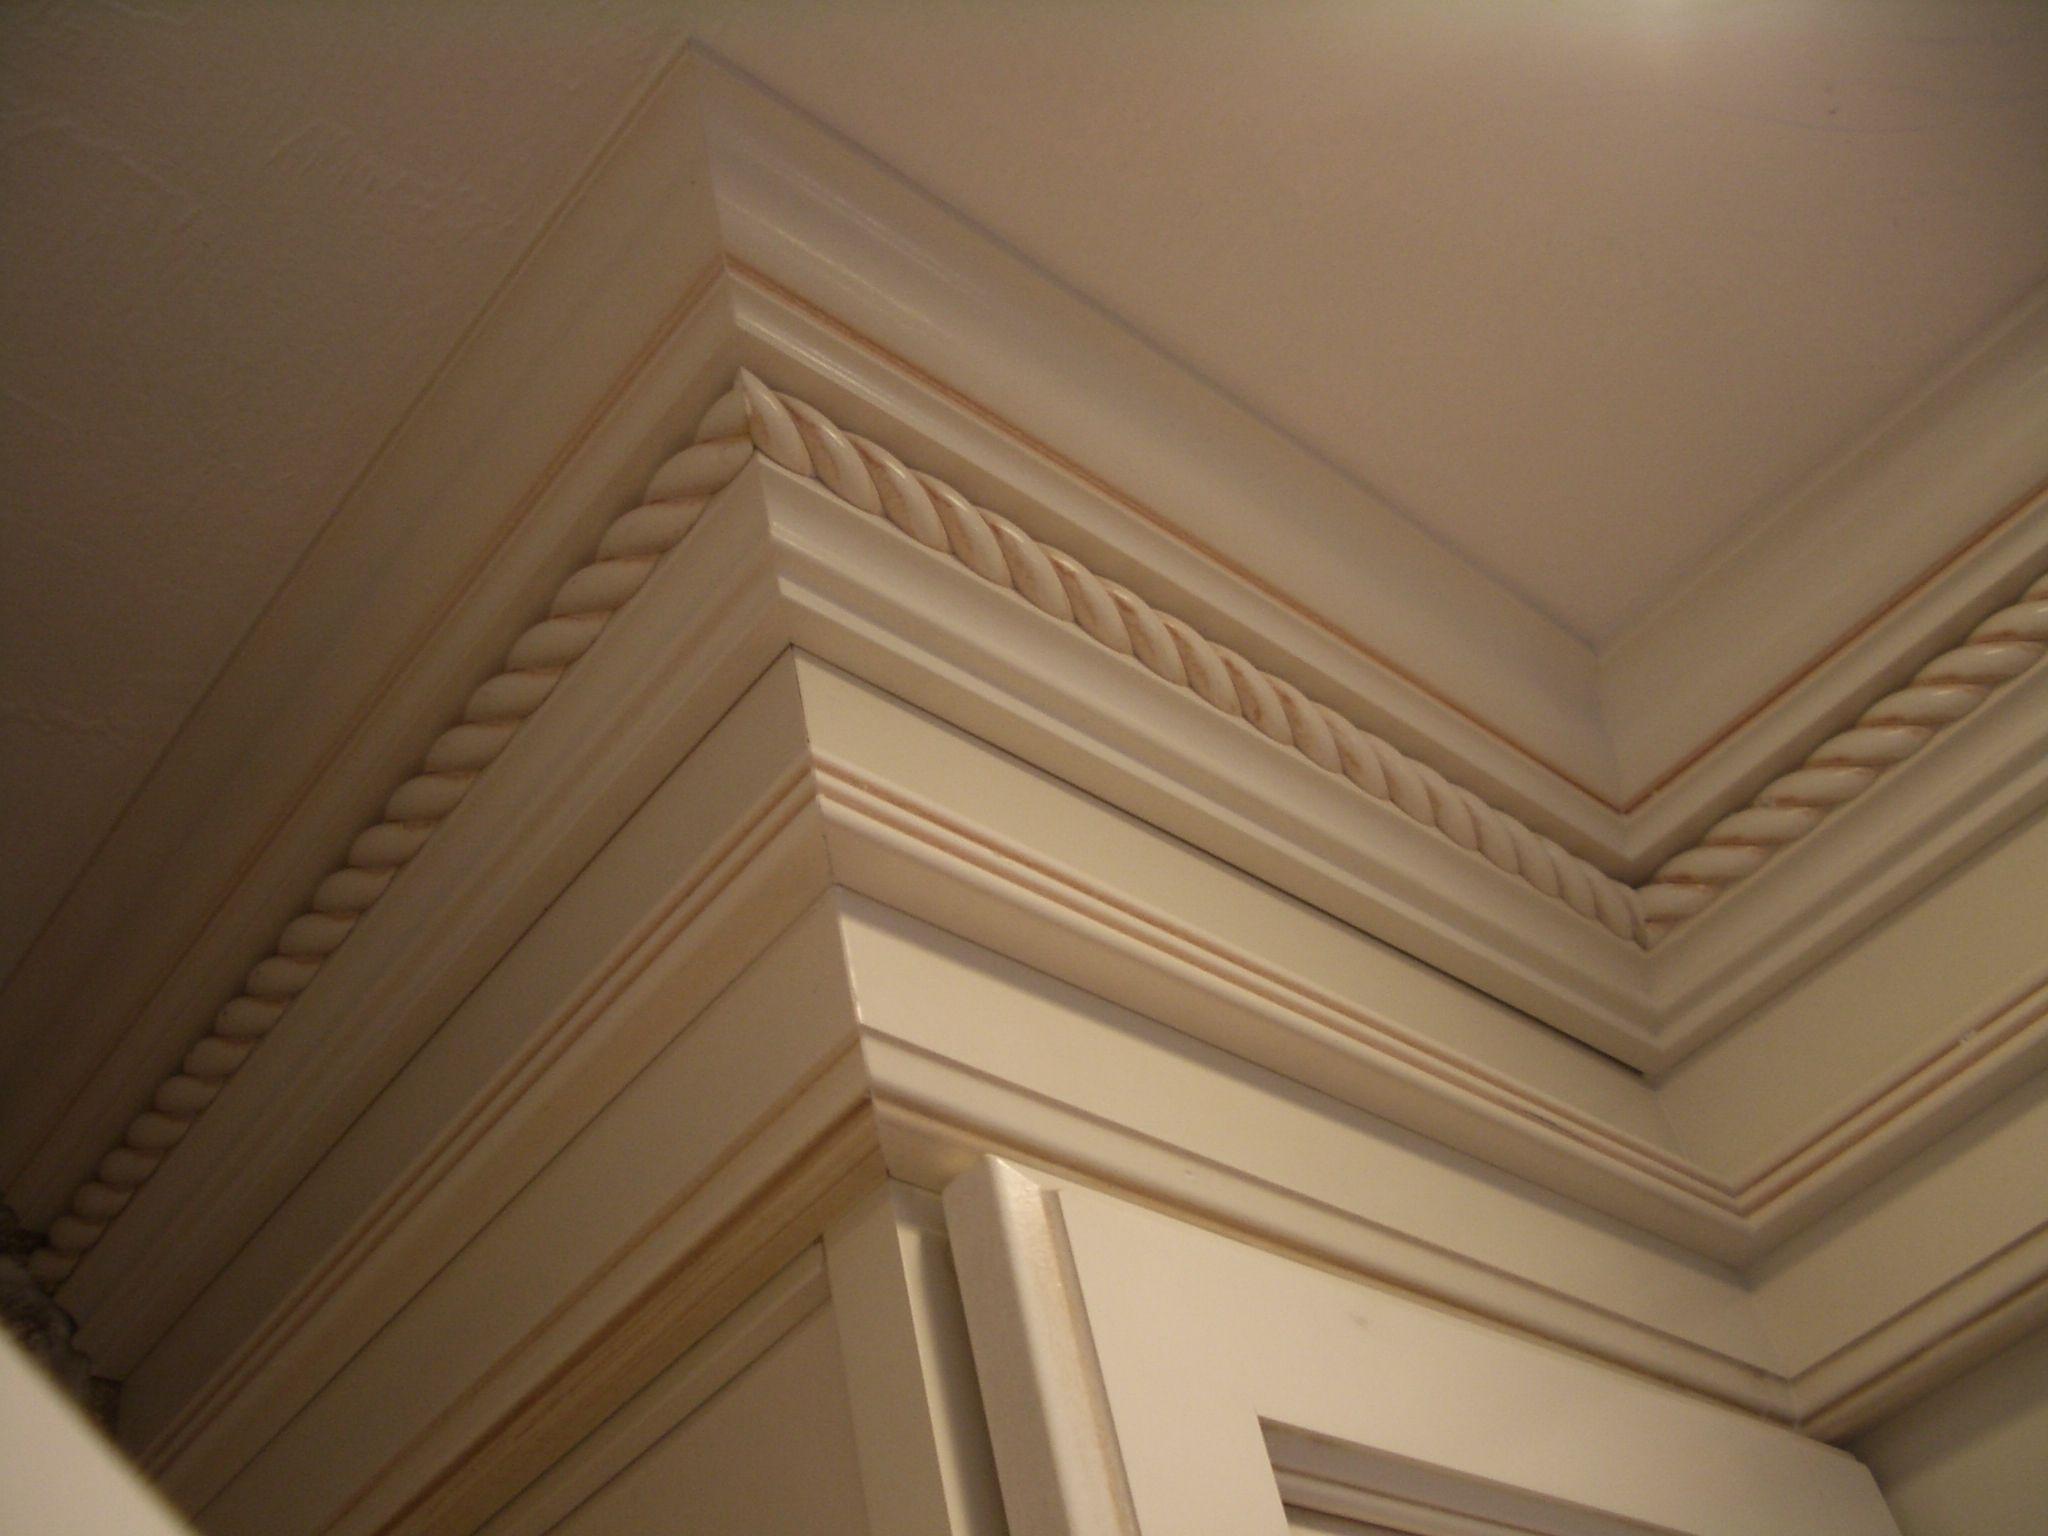 diamond kitchen cabinets Painted cabinets crown rope molding moulding kitchen trim antique paint